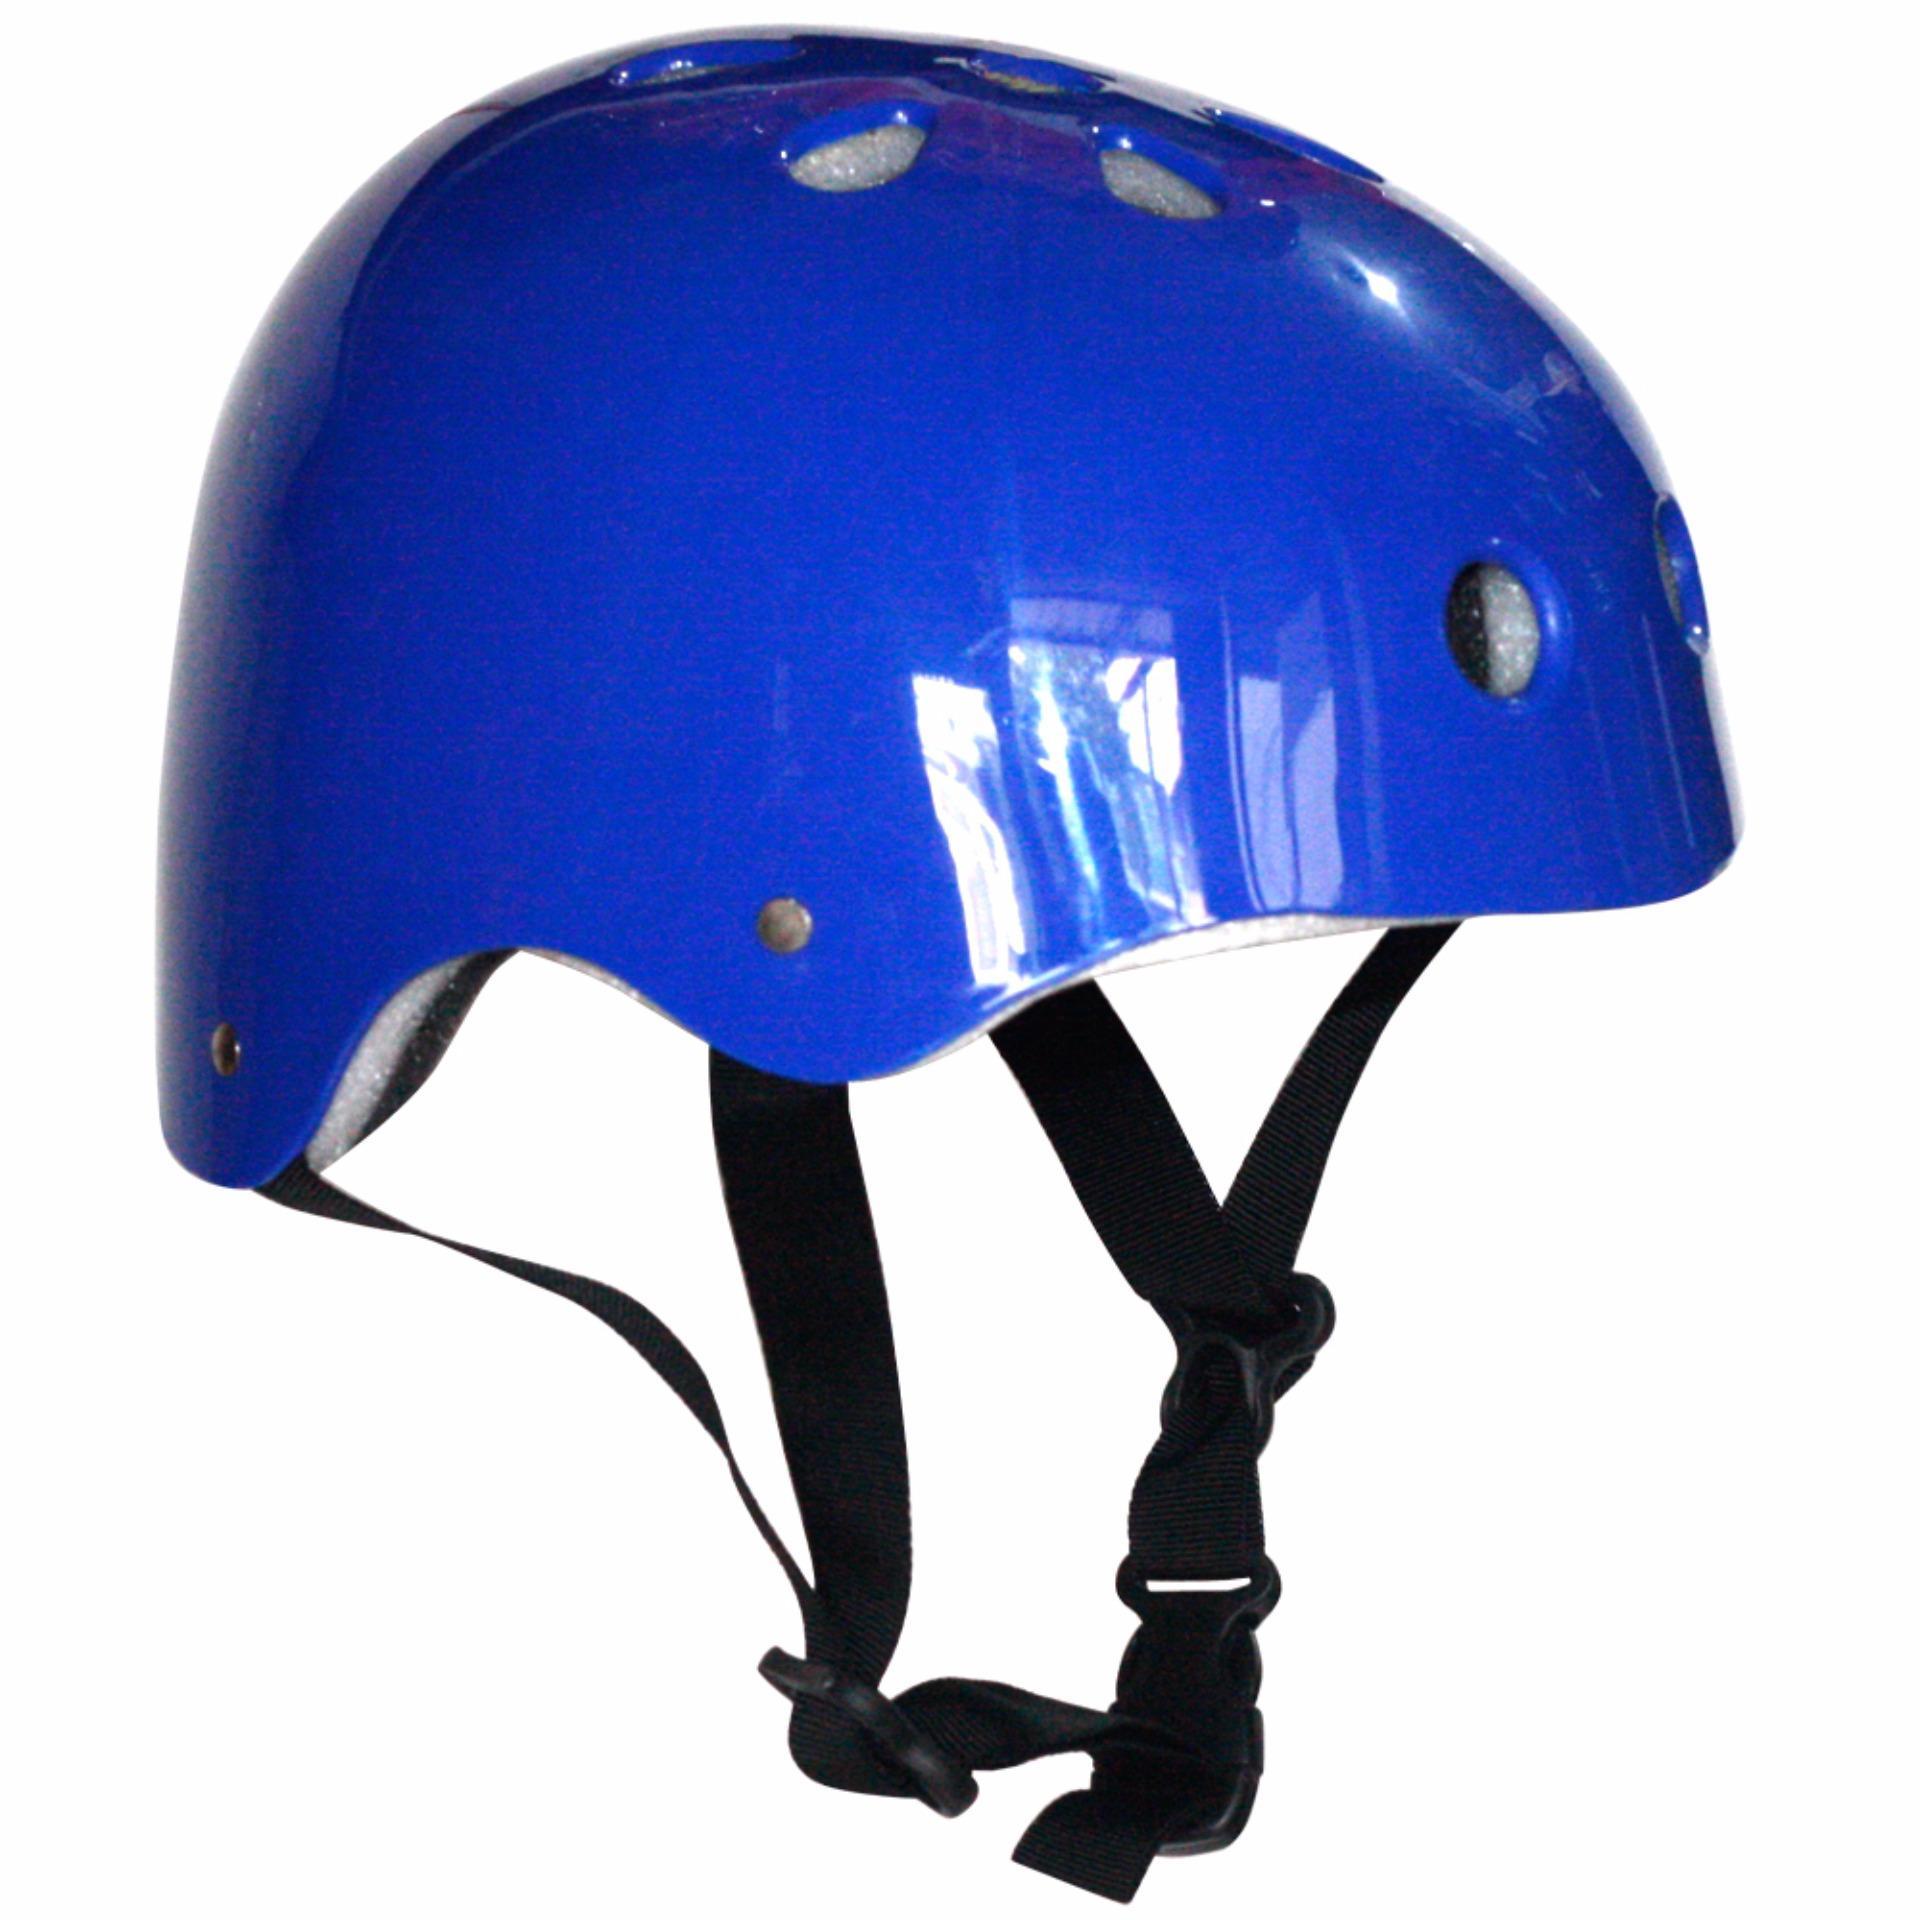 Onsight Helm Outbond Rafting Msr Daftar Harga Terbaru Sketch V1 Biru Sepeda Multi